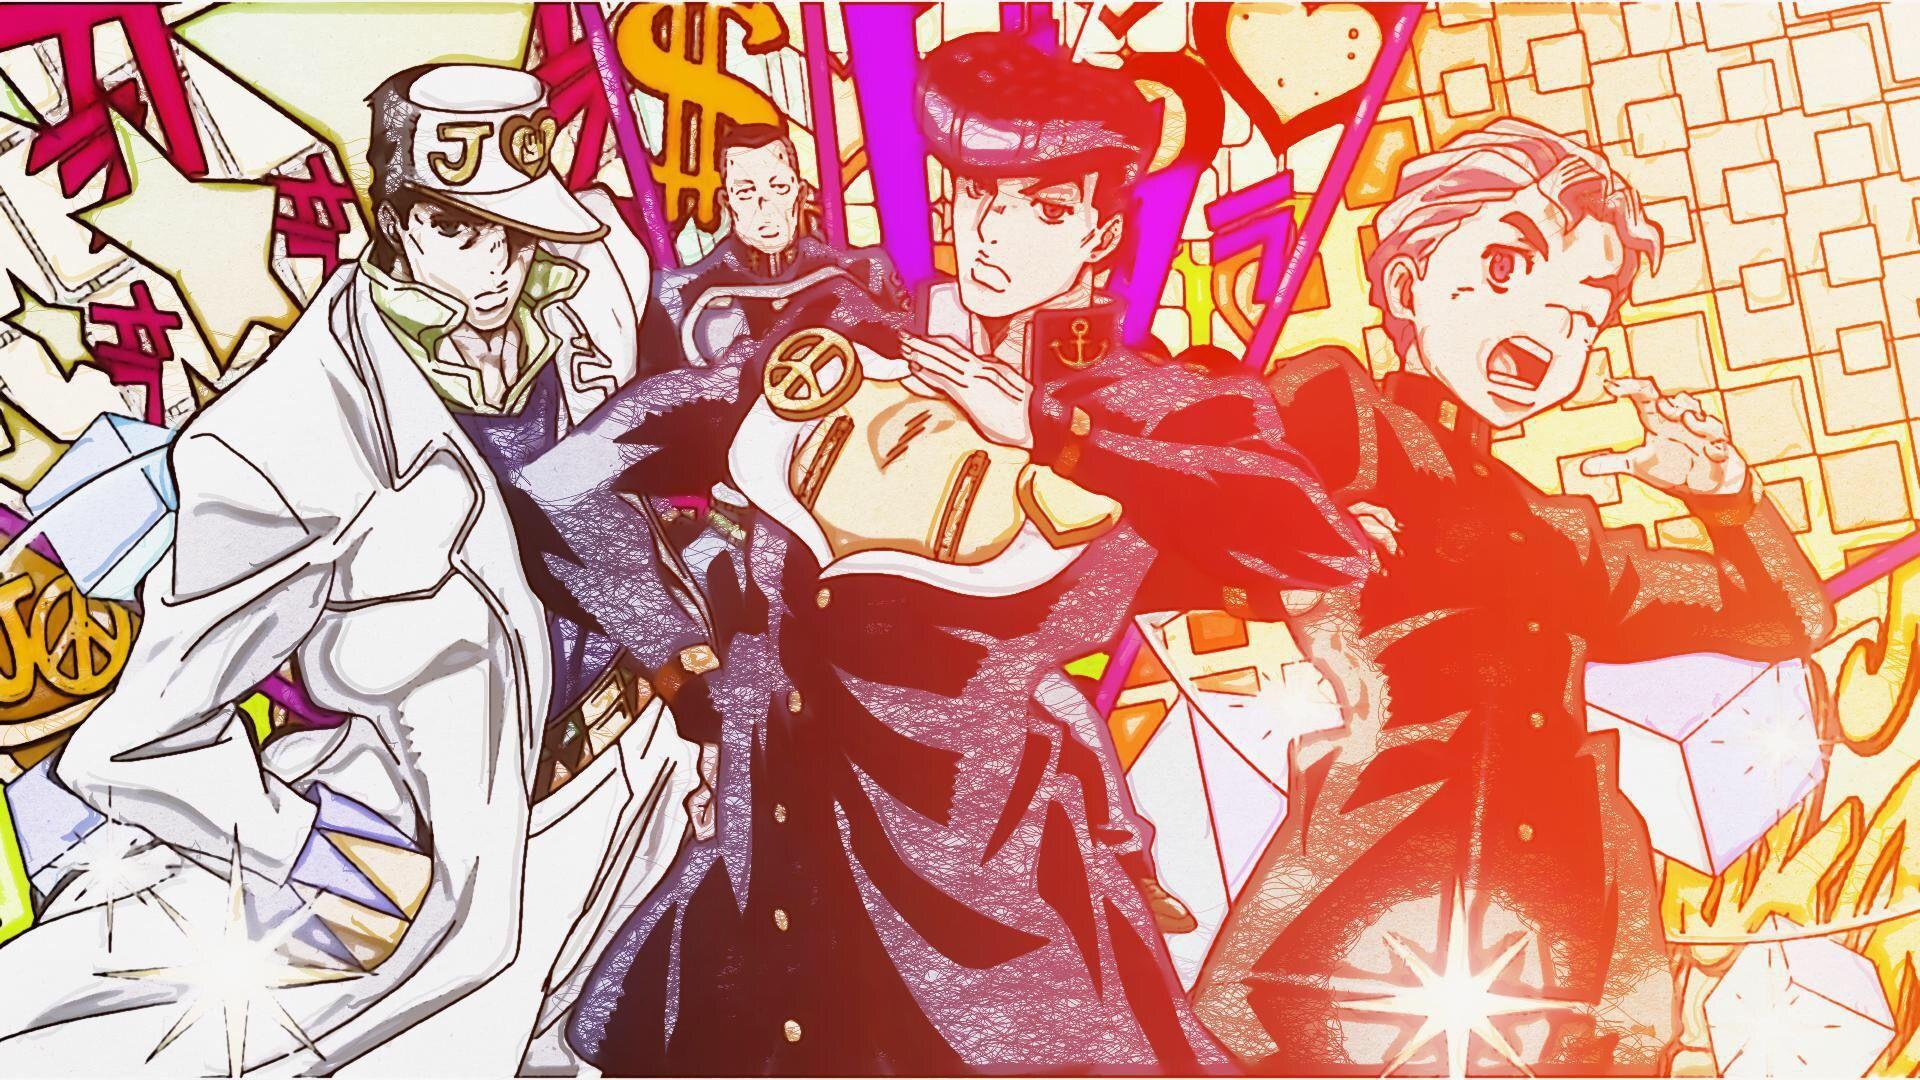 Pin de Sean Damsteegt en Anime Fondos